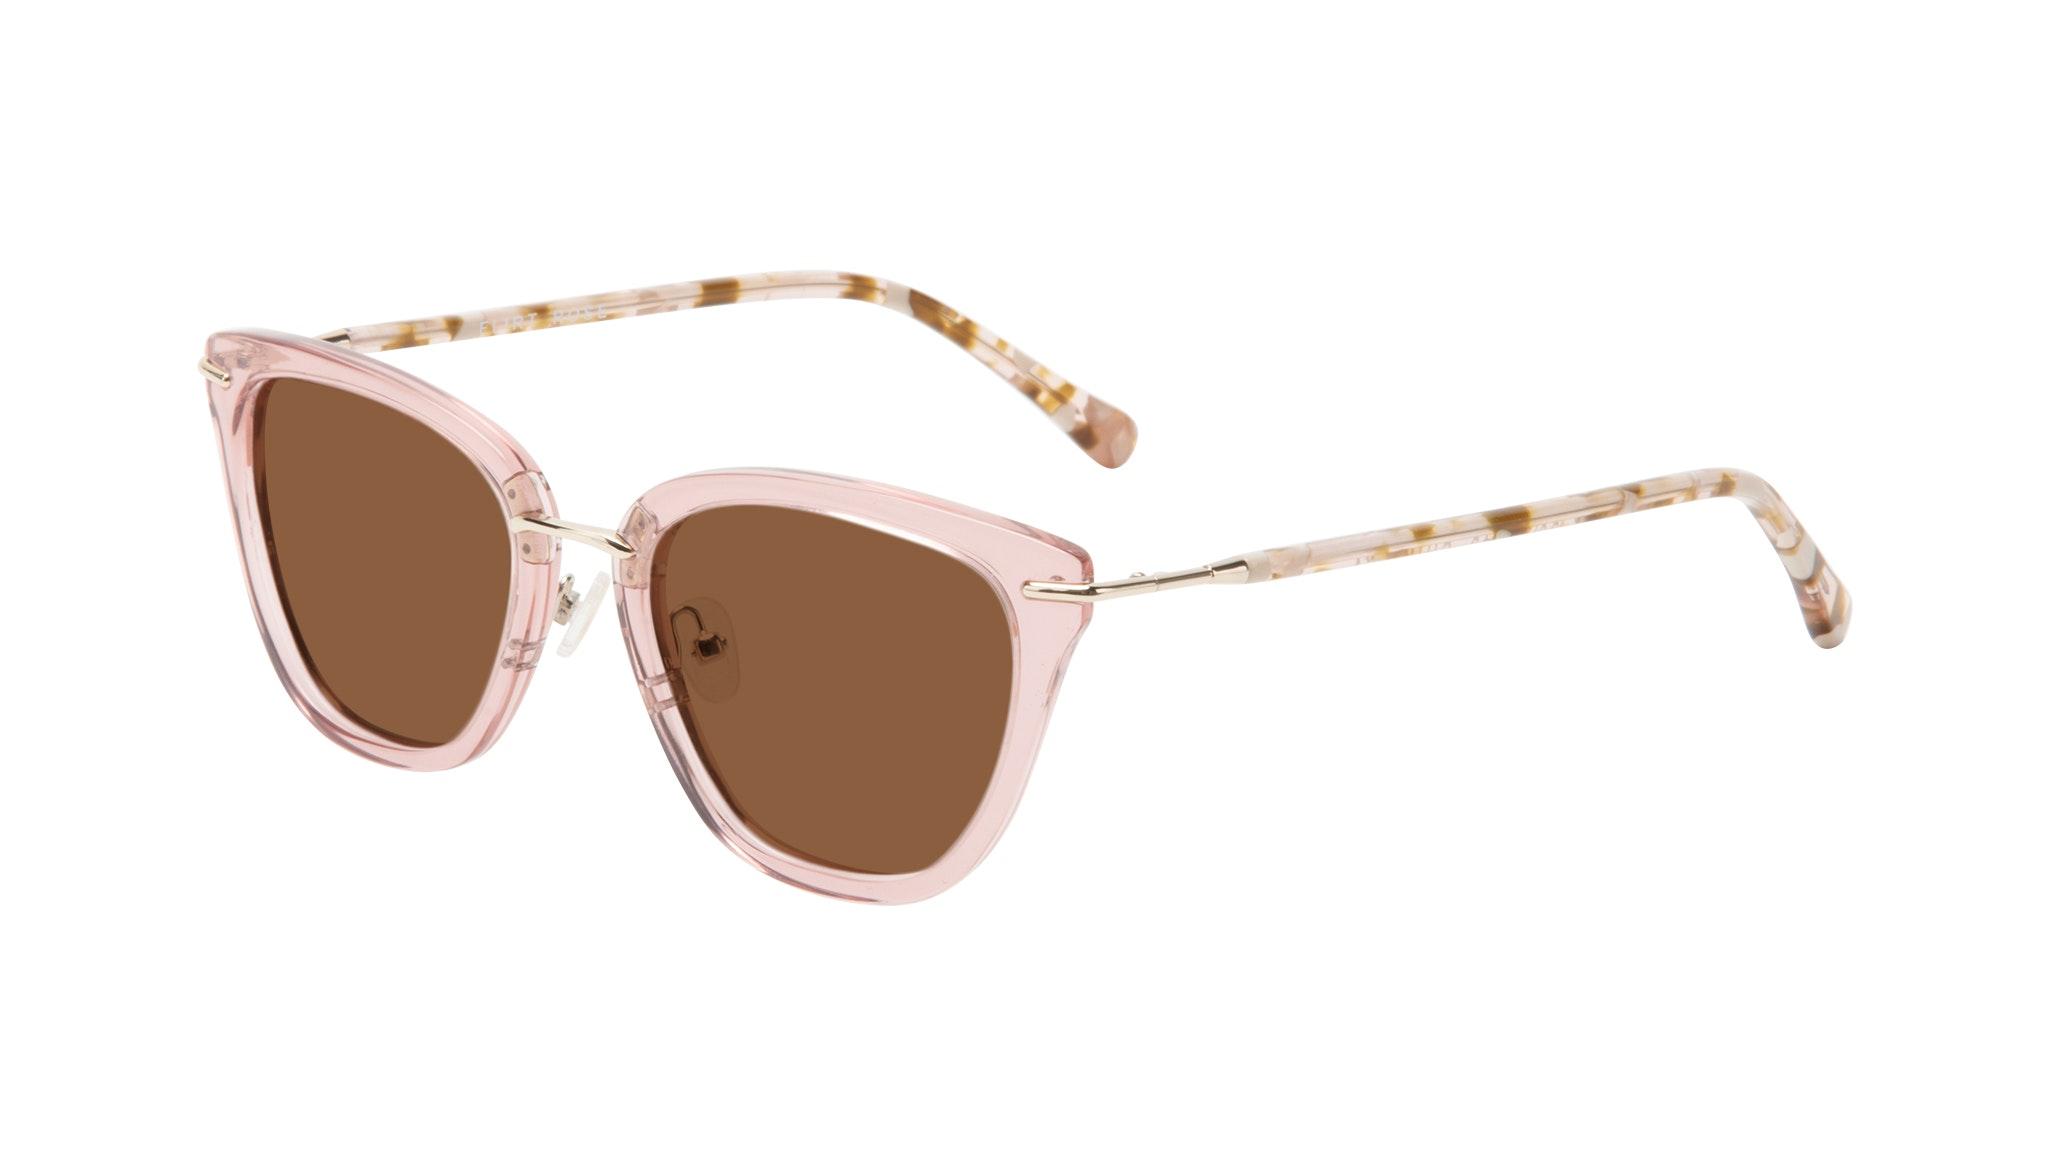 Affordable Fashion Glasses Square Sunglasses Women Flirt Rose Tilt